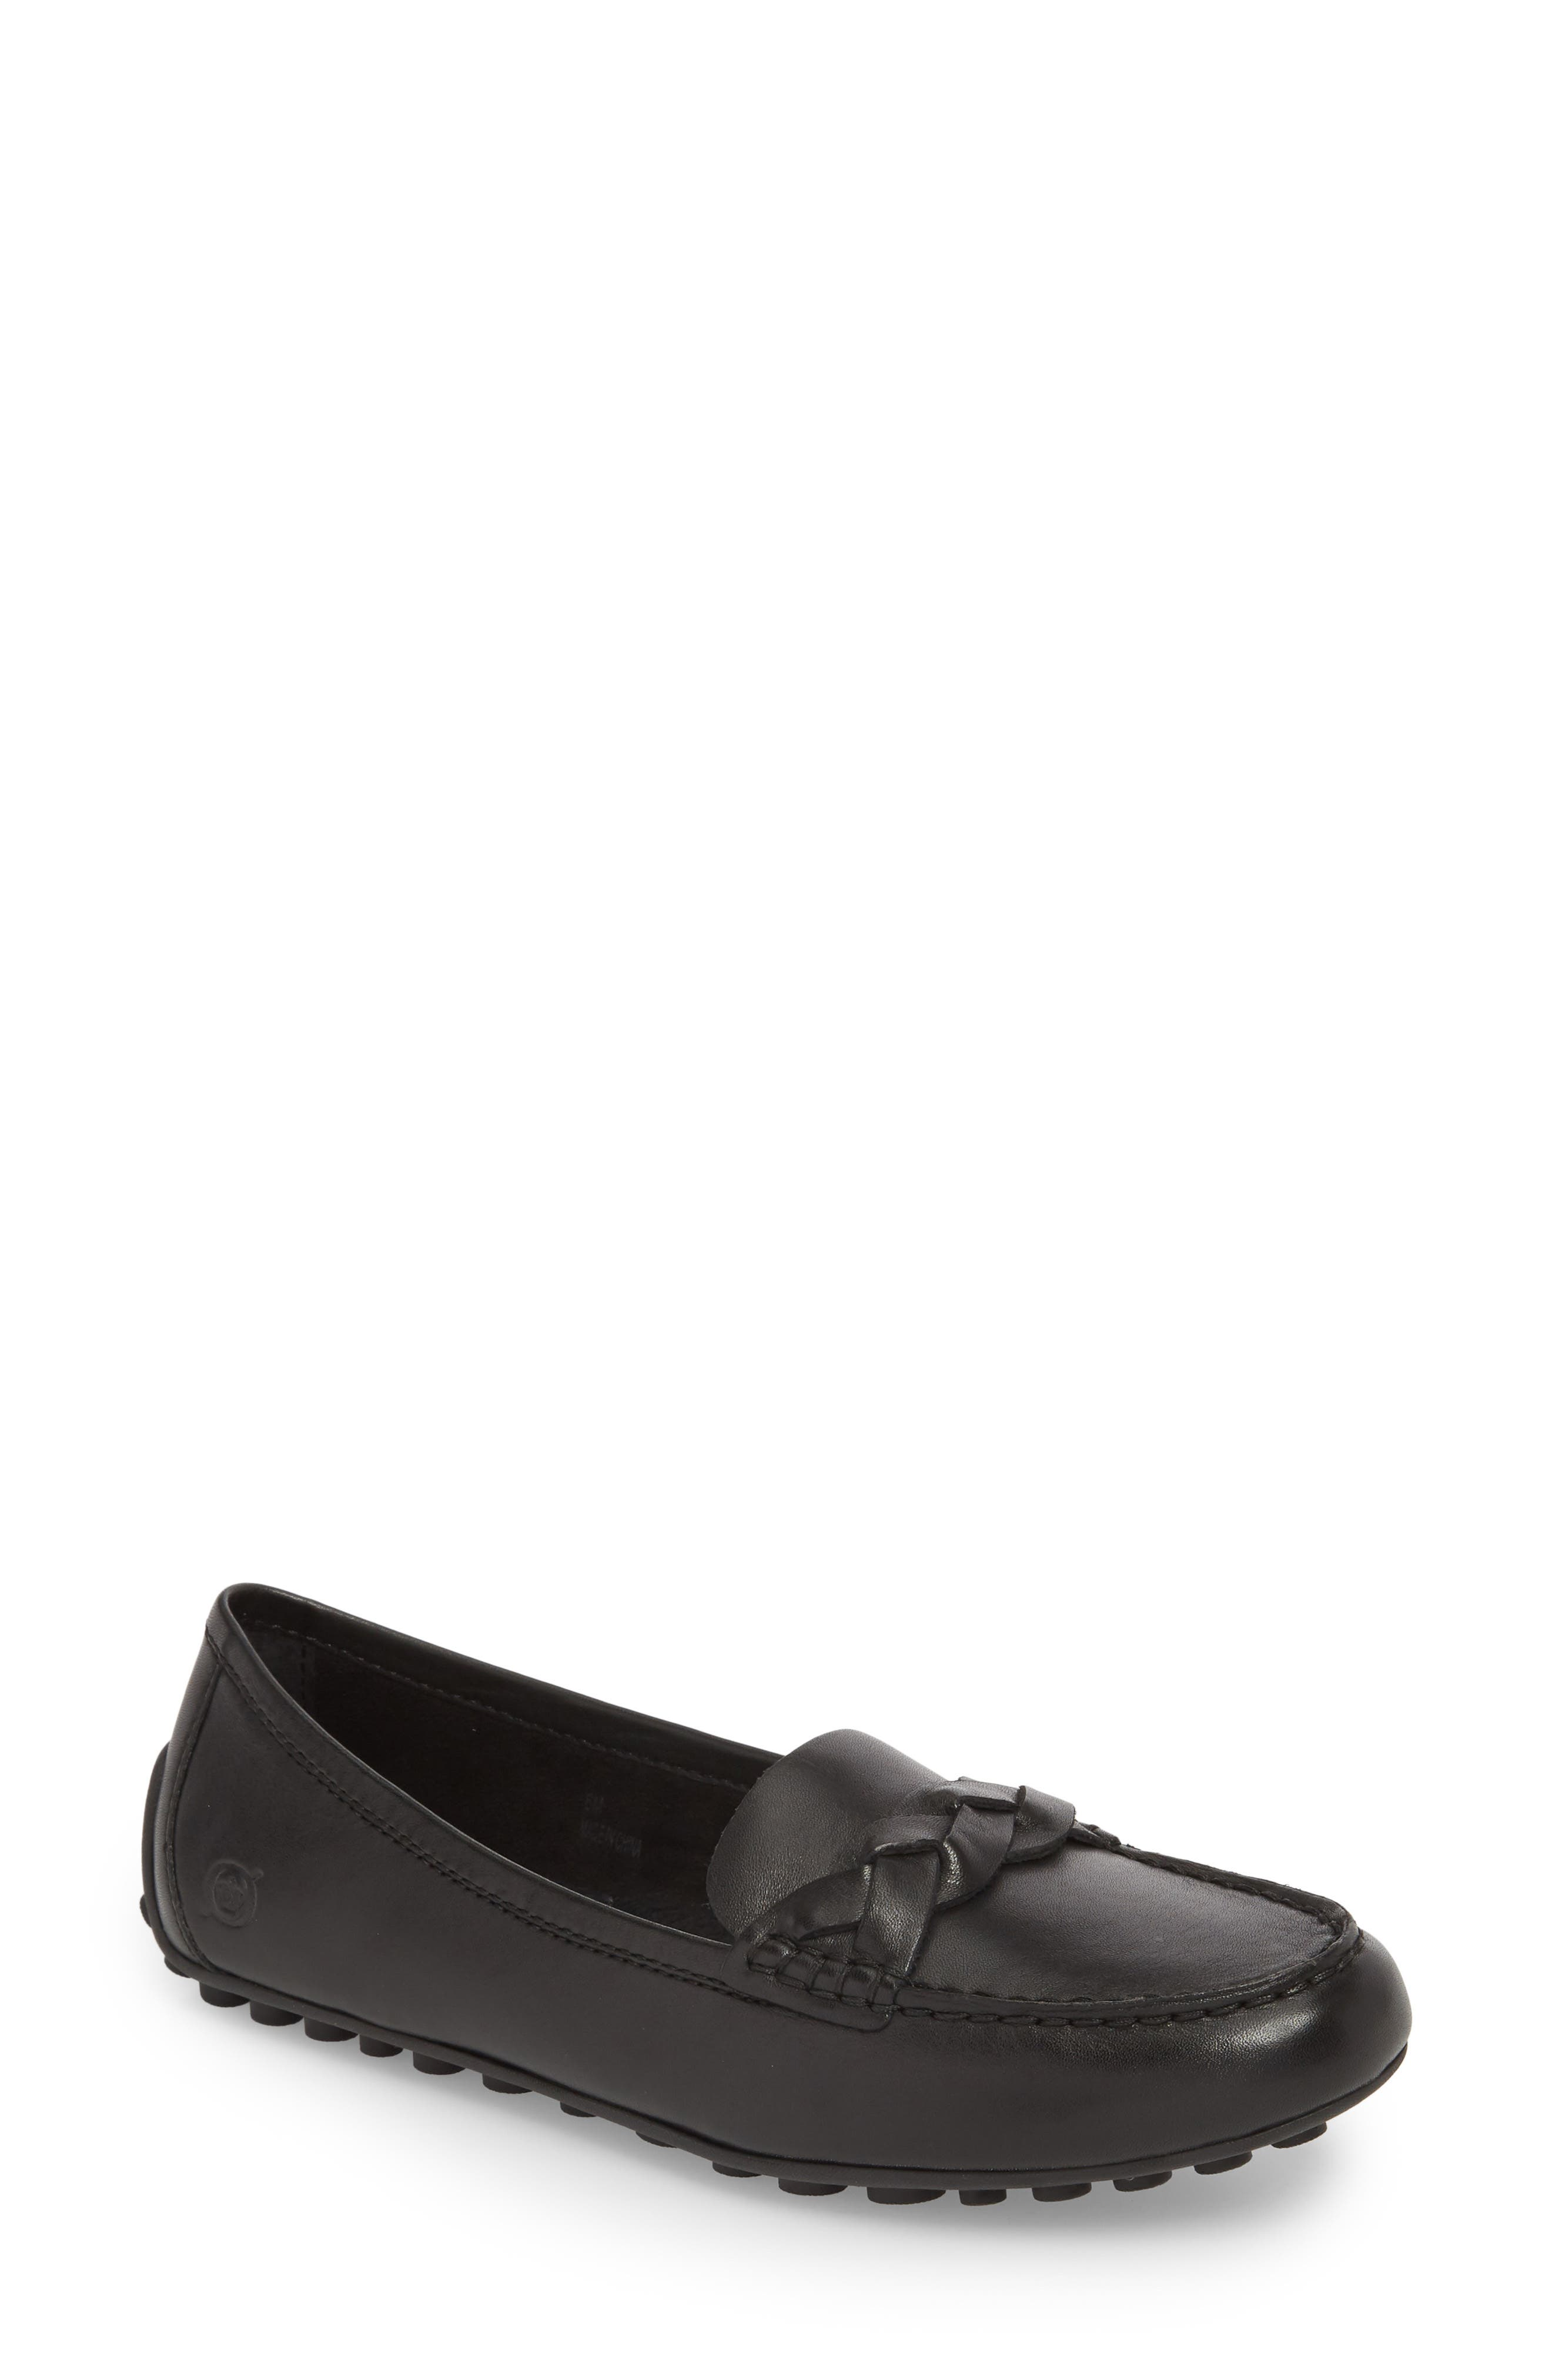 Kasa Loafer,                             Main thumbnail 1, color,                             Black Leather